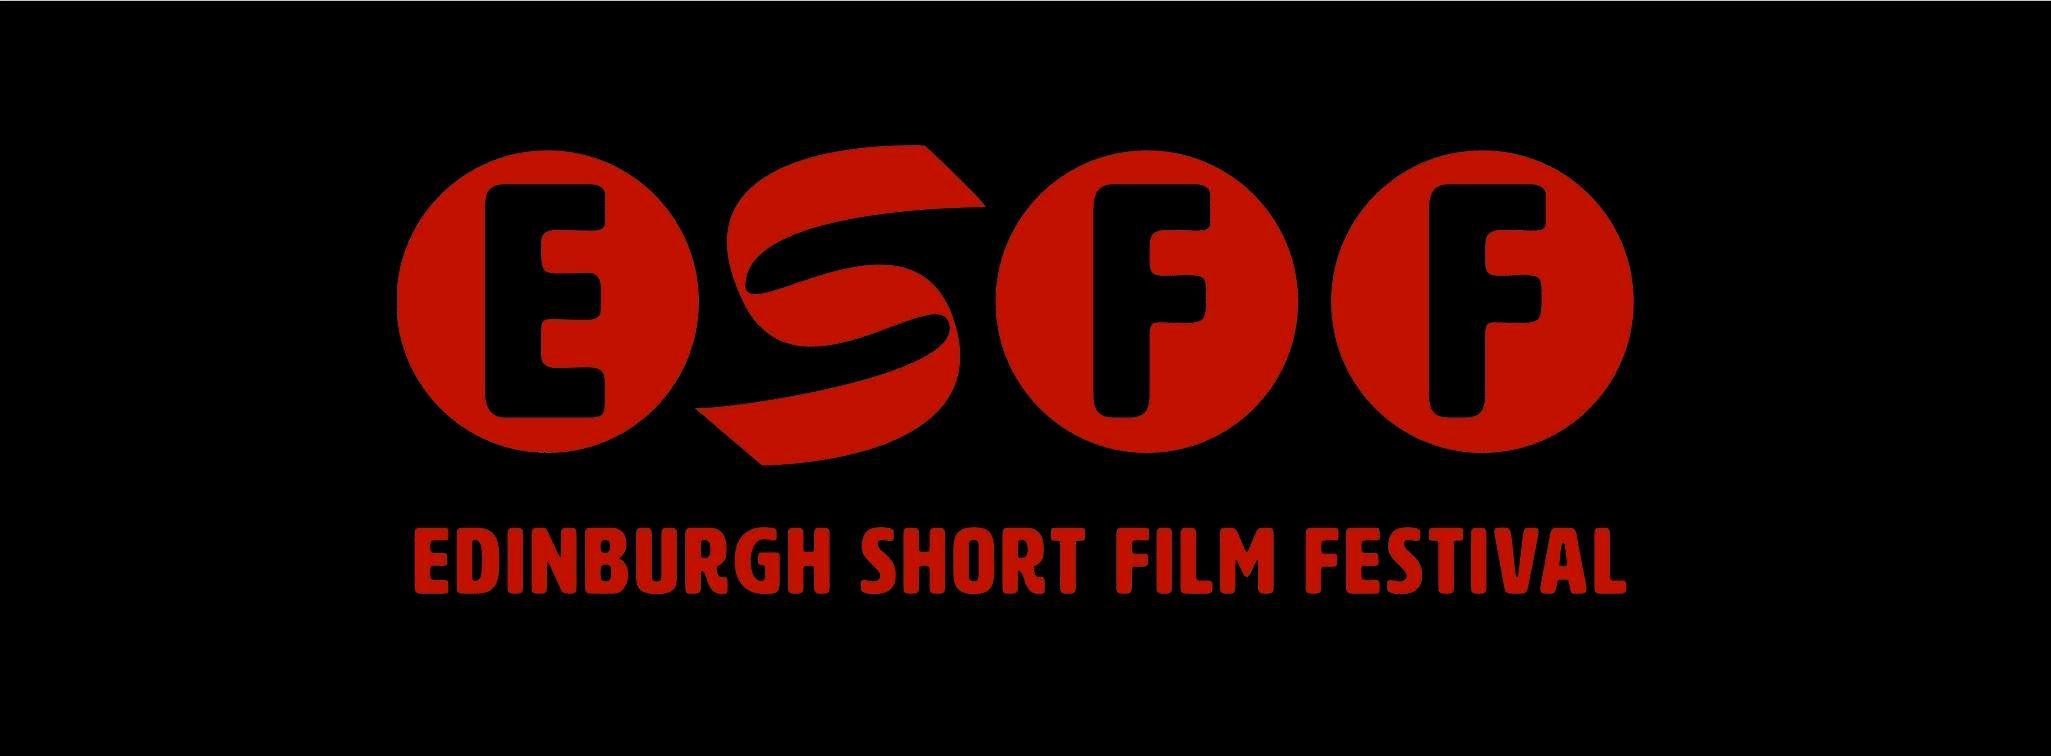 www.edinburghshortfilmfestival.com